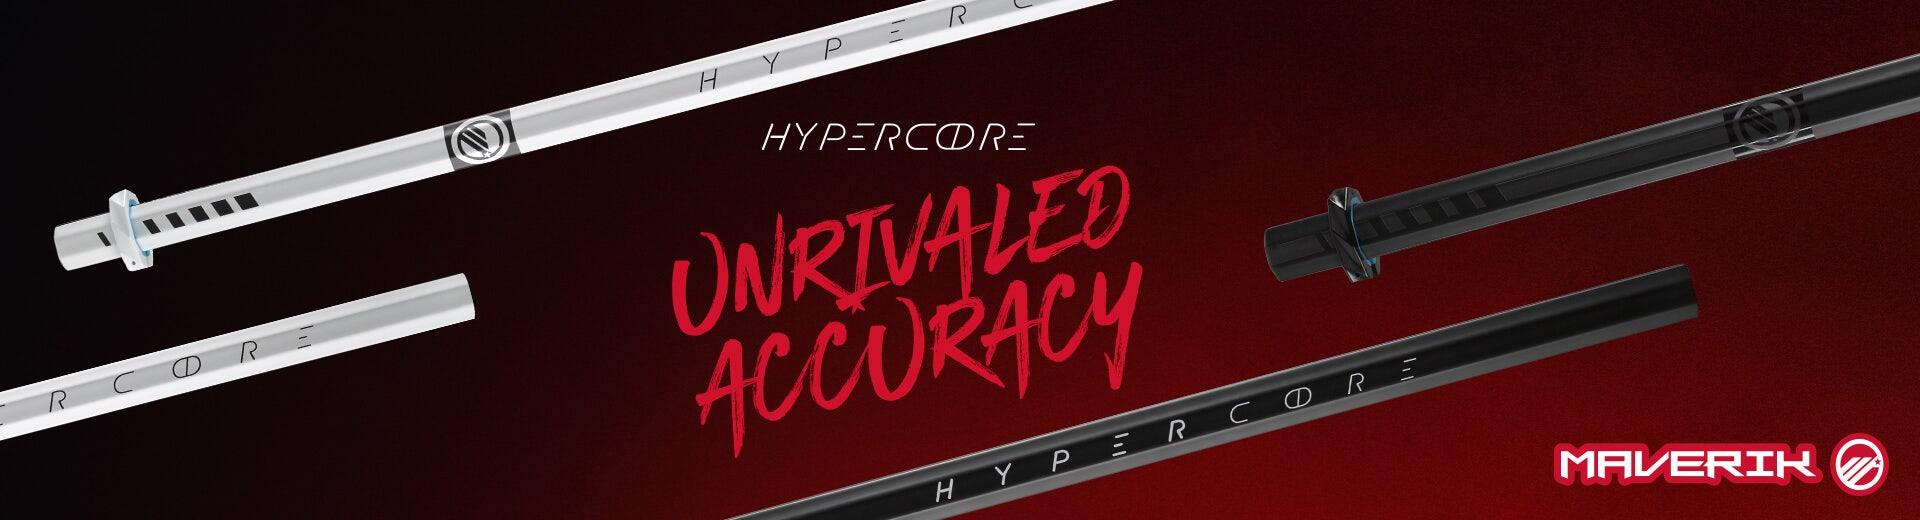 Maverik Hypercore - DESKTOP